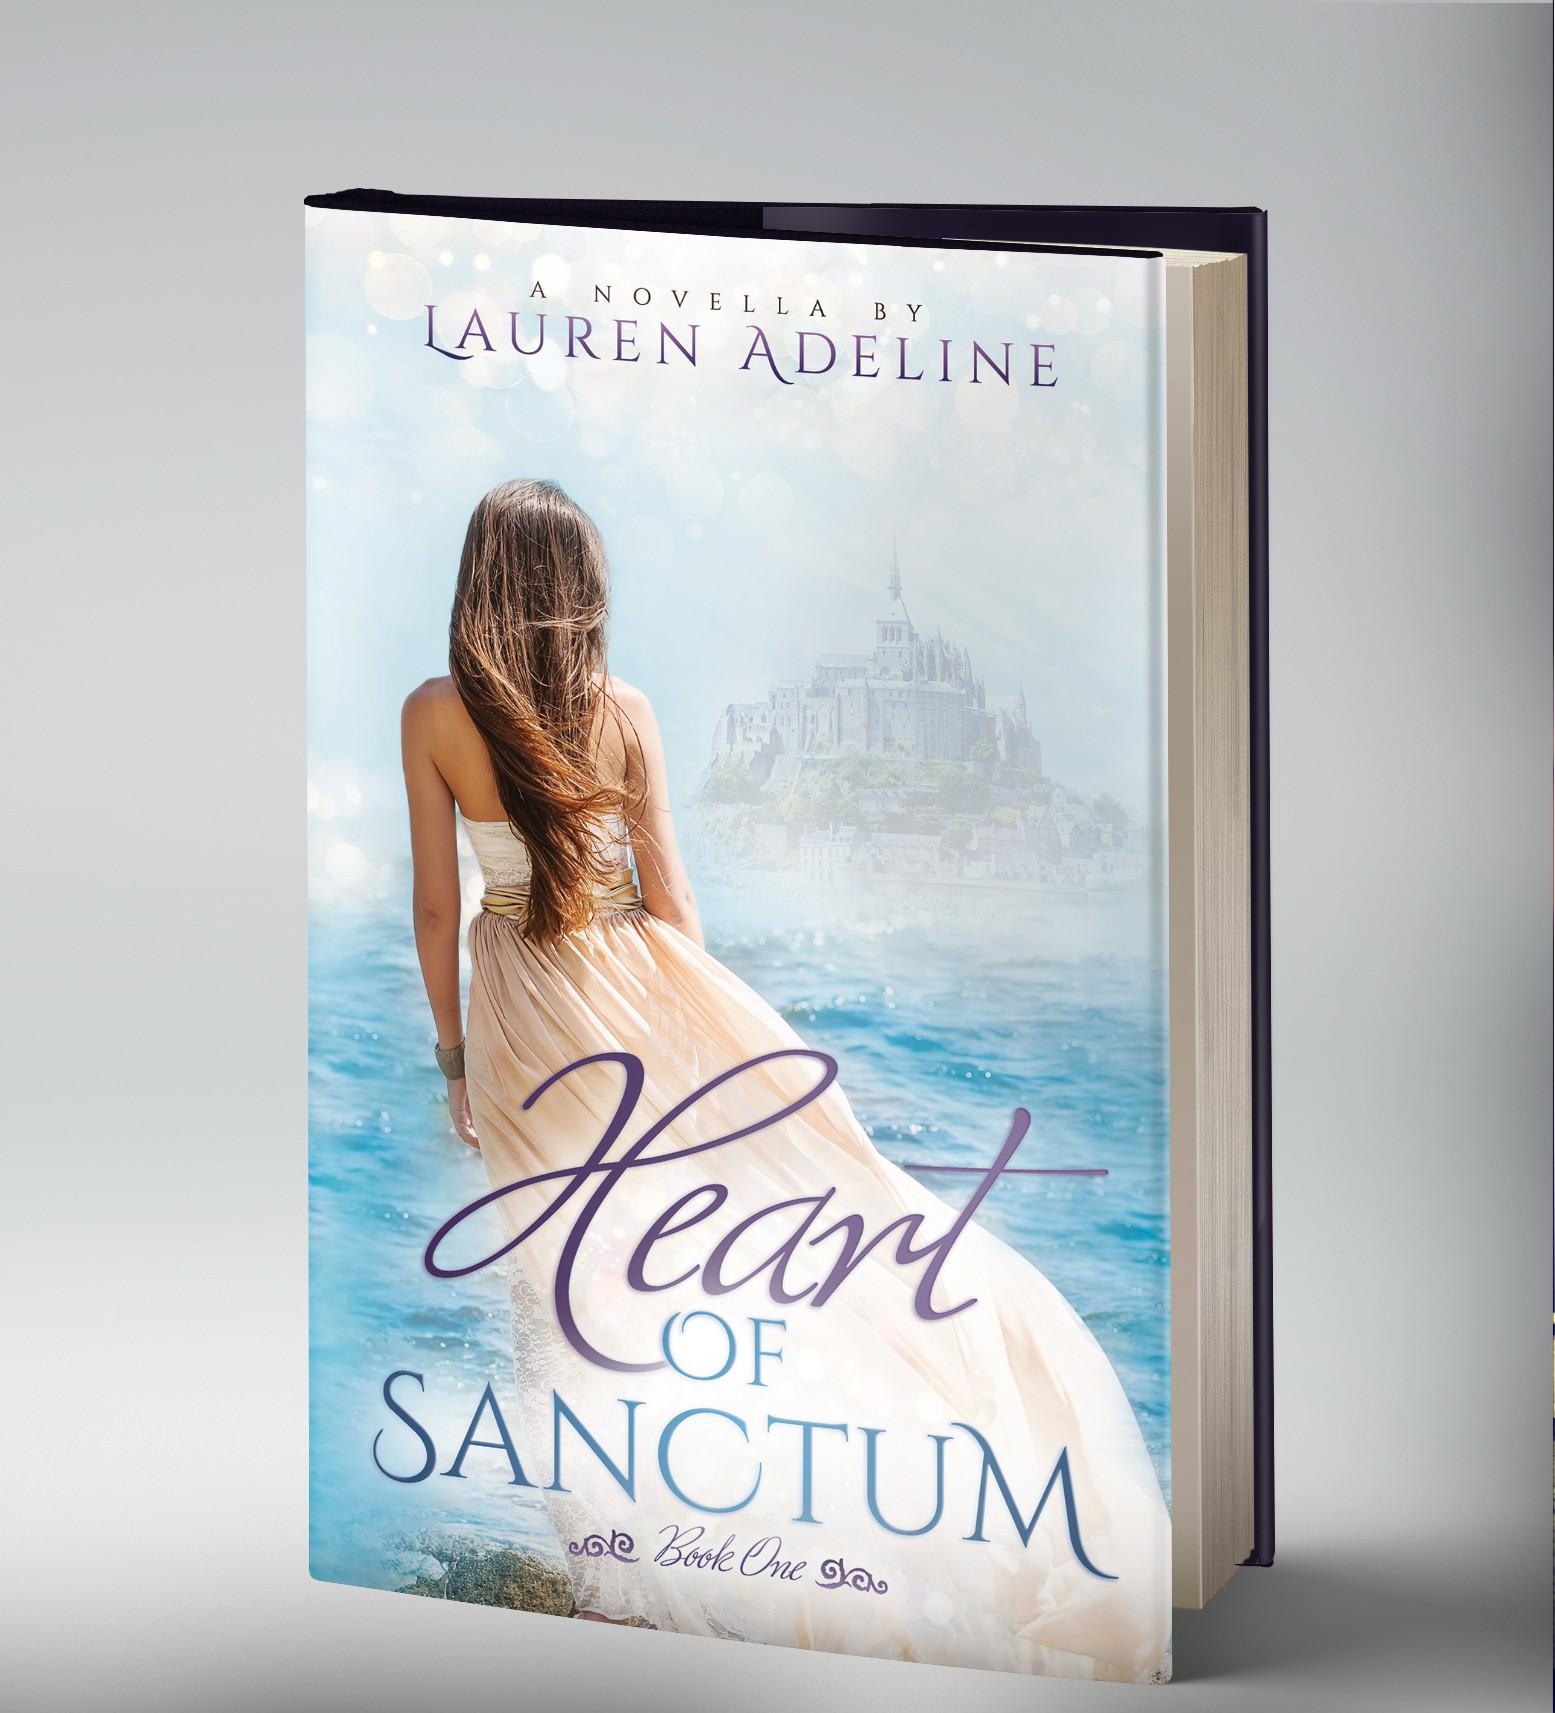 Create a YA Romance/Fantasy Book Cover